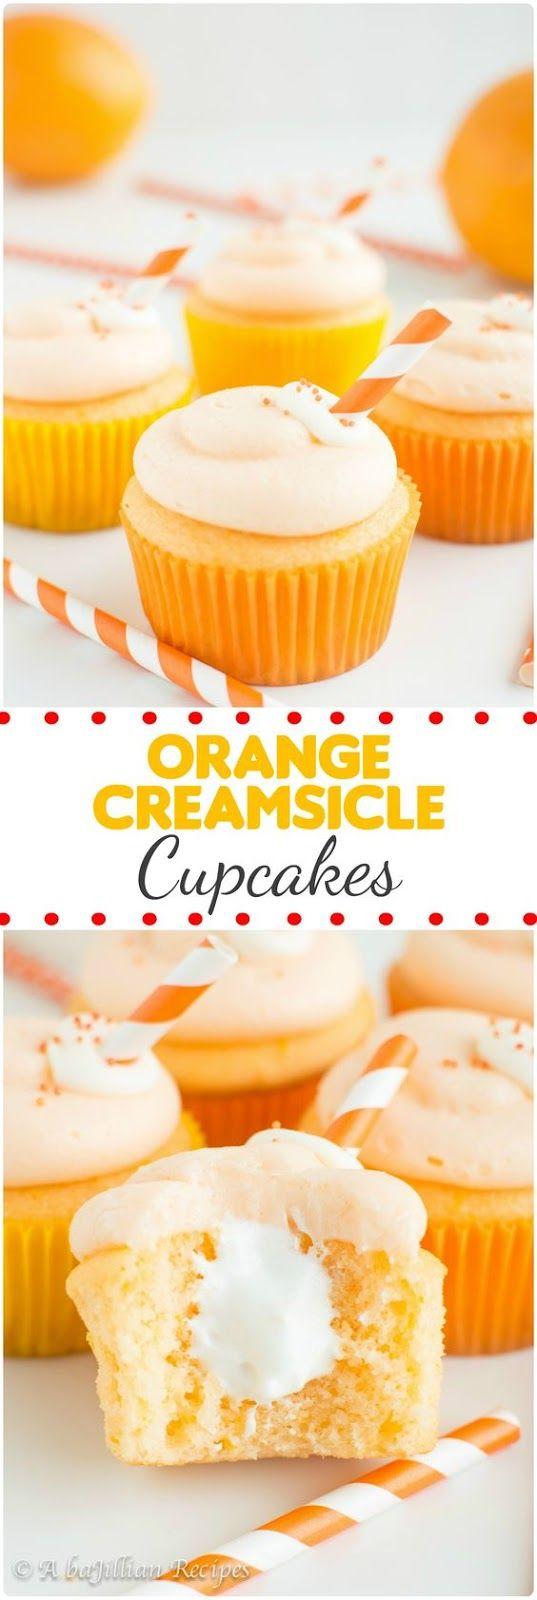 ORANGE CREAMSICLE CUPCAKES   Cake And Food Recipe